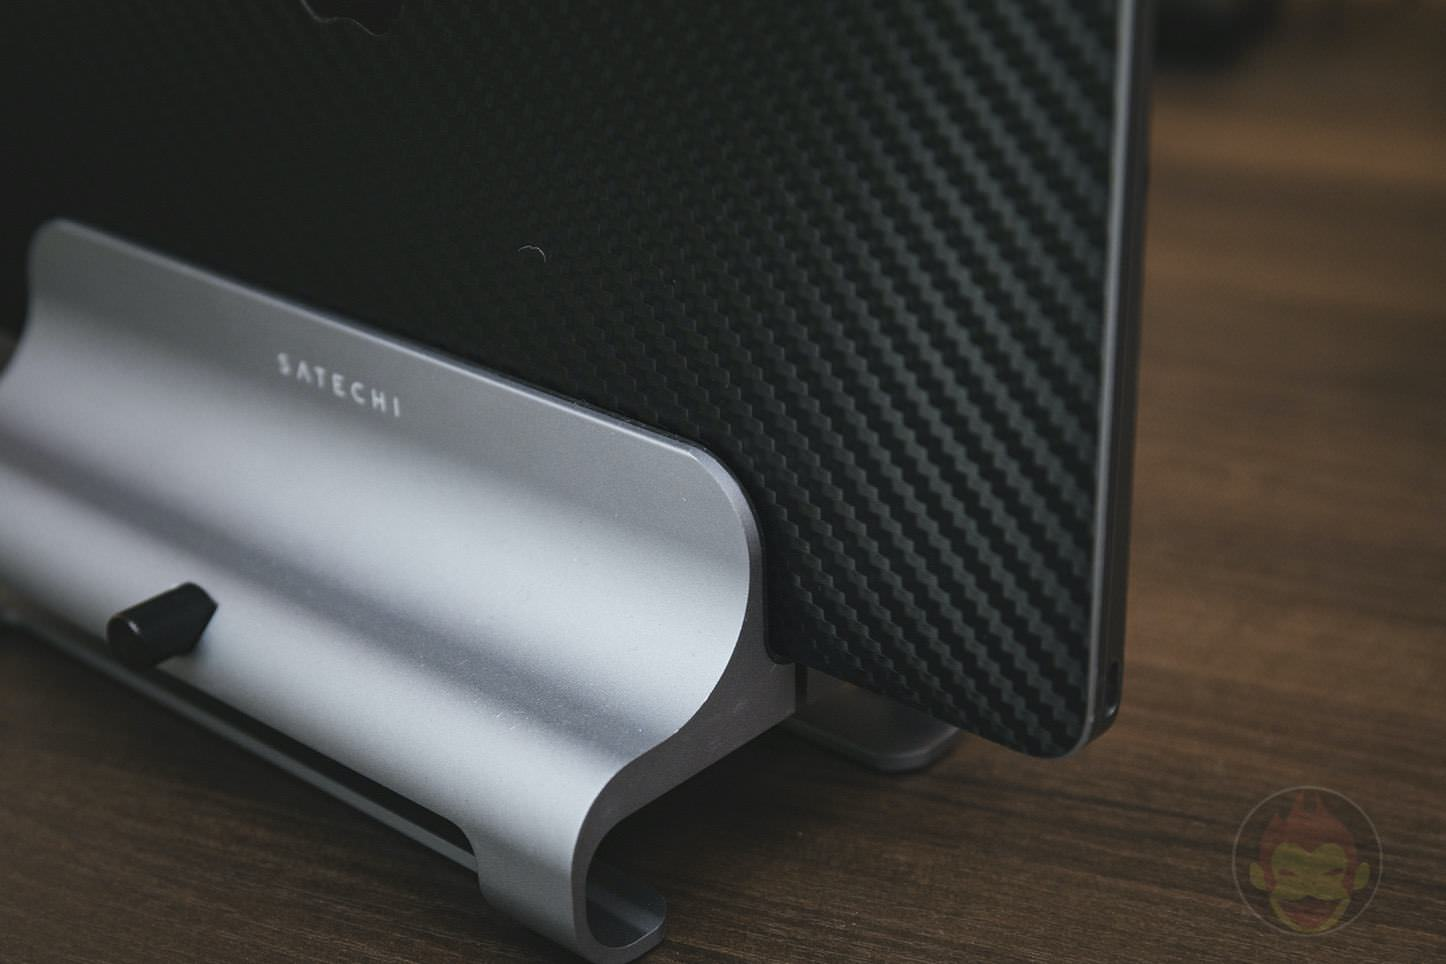 Satechi-Universal-Aluminum-Laptop-Stand-09.jpg